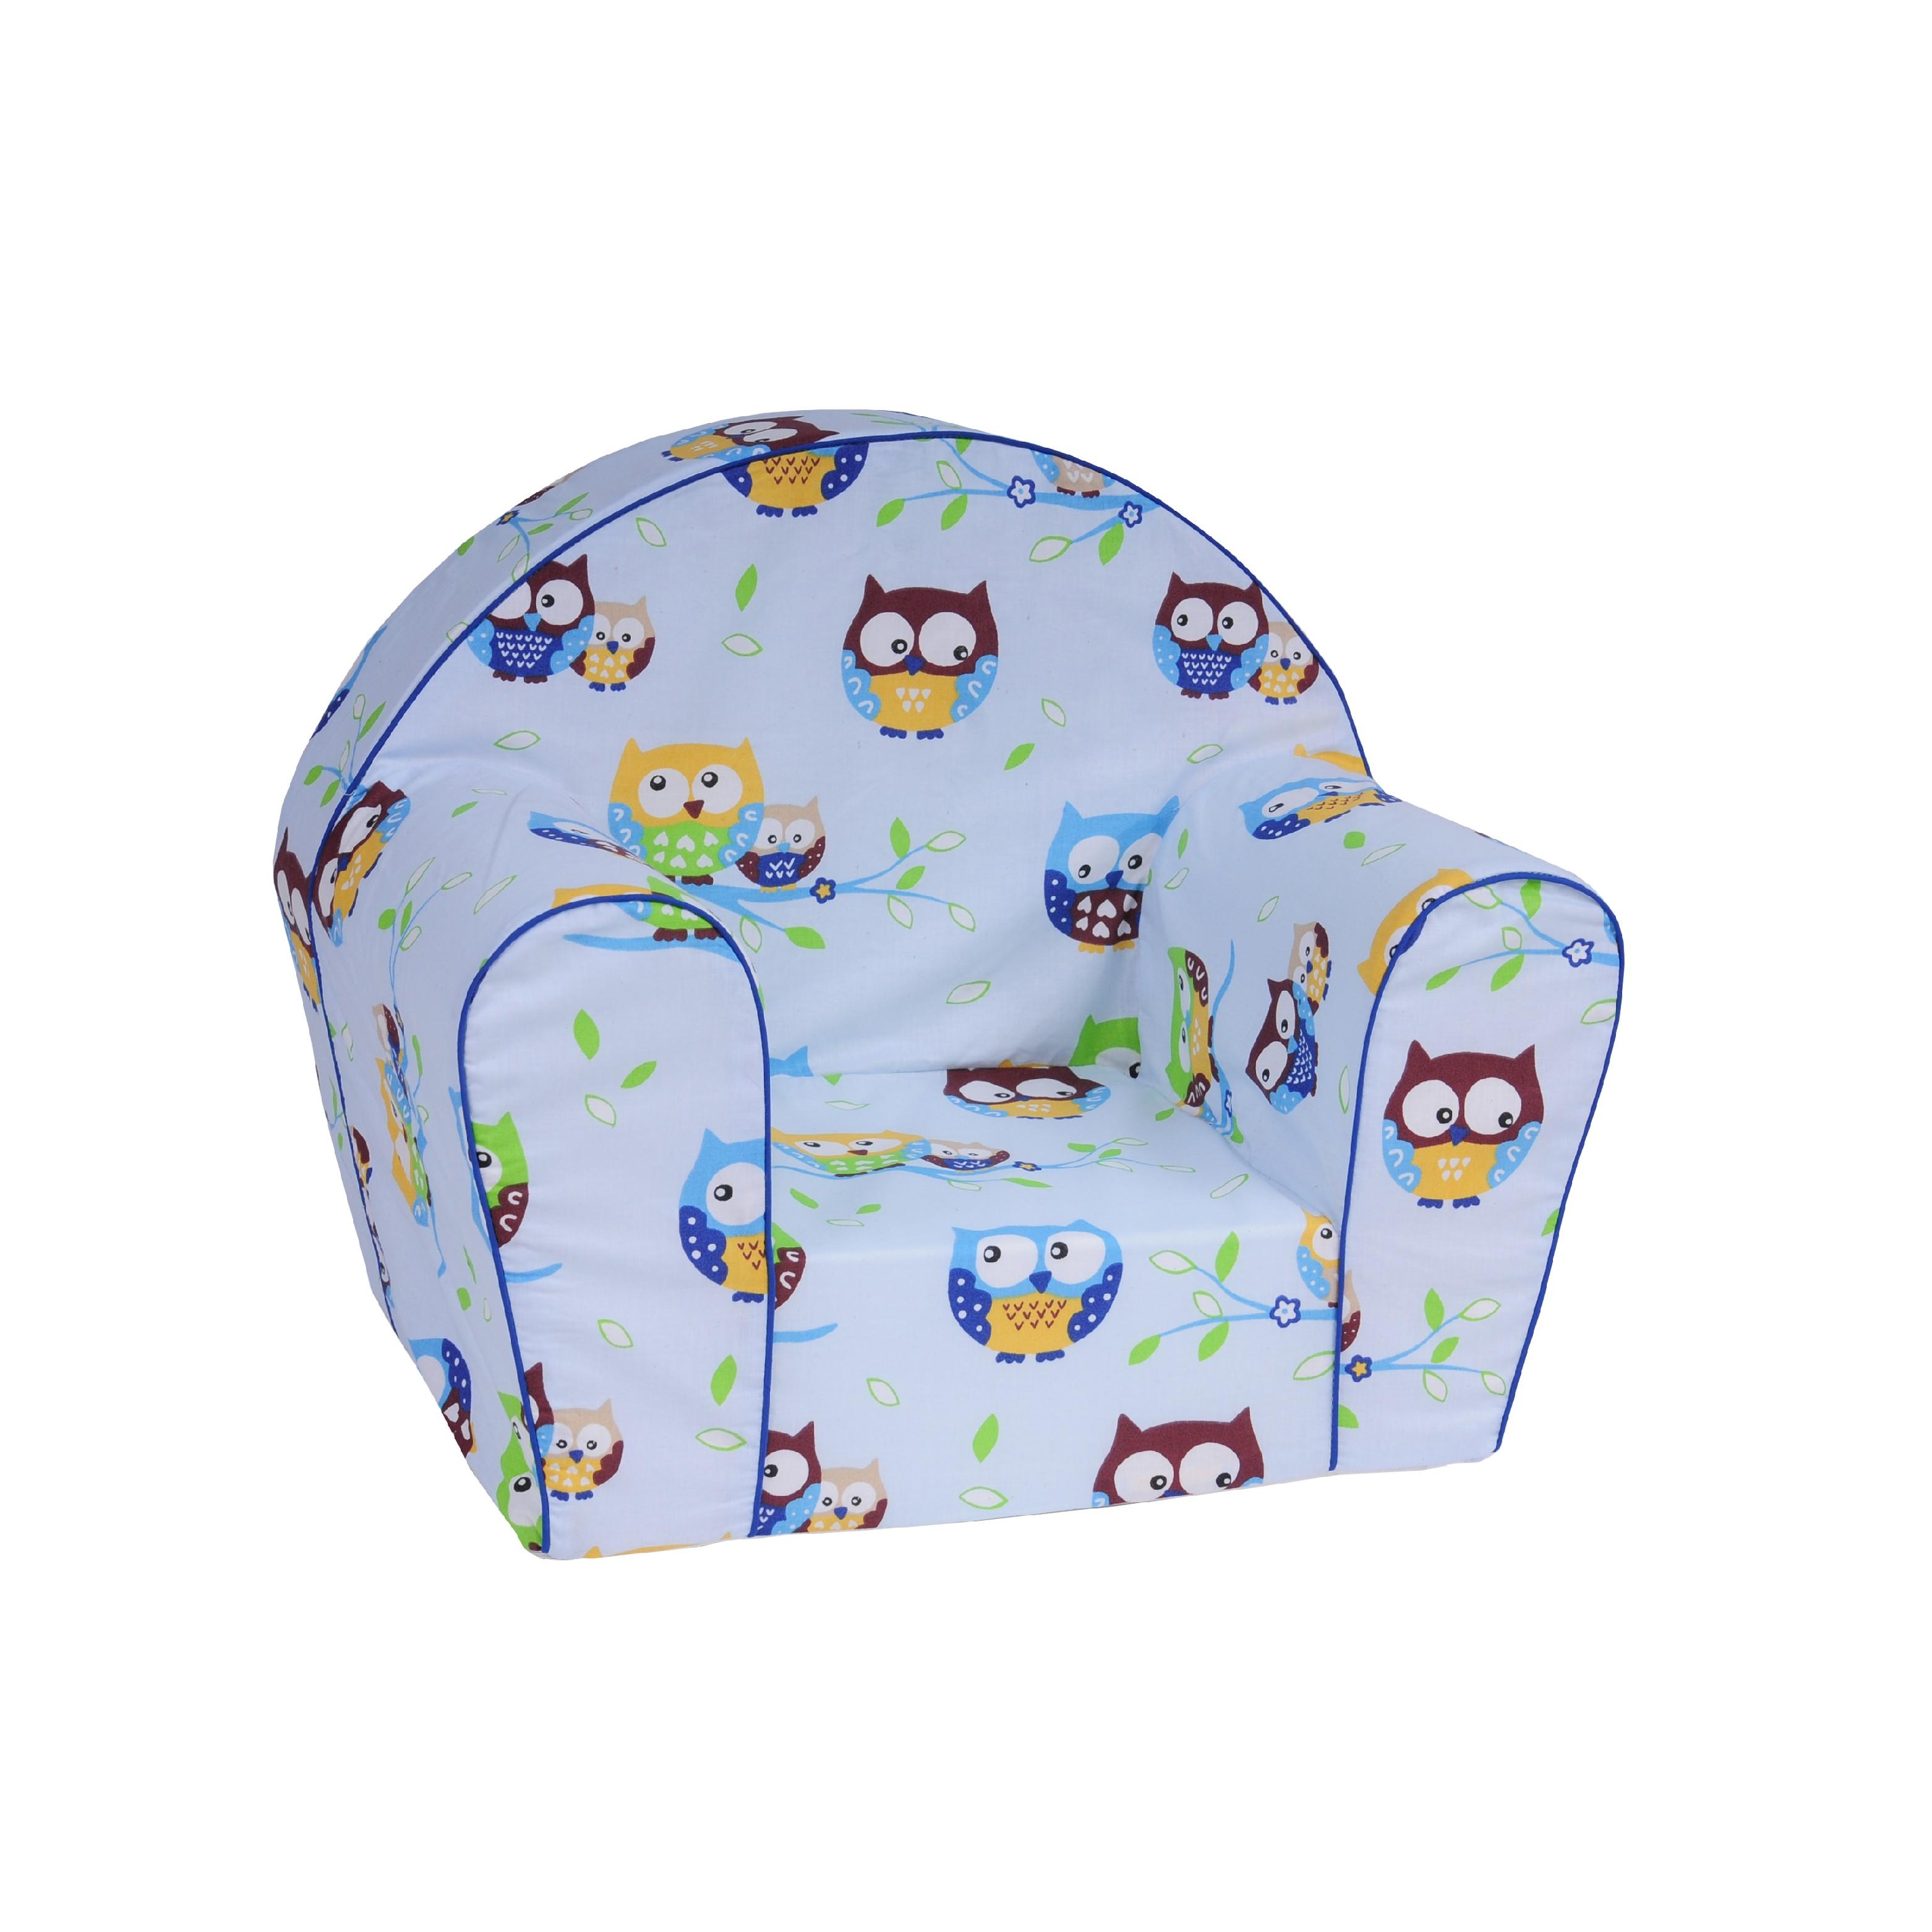 TEX-IM Dětské křesílko Baby Vzor  Modrá sova fef76df2335